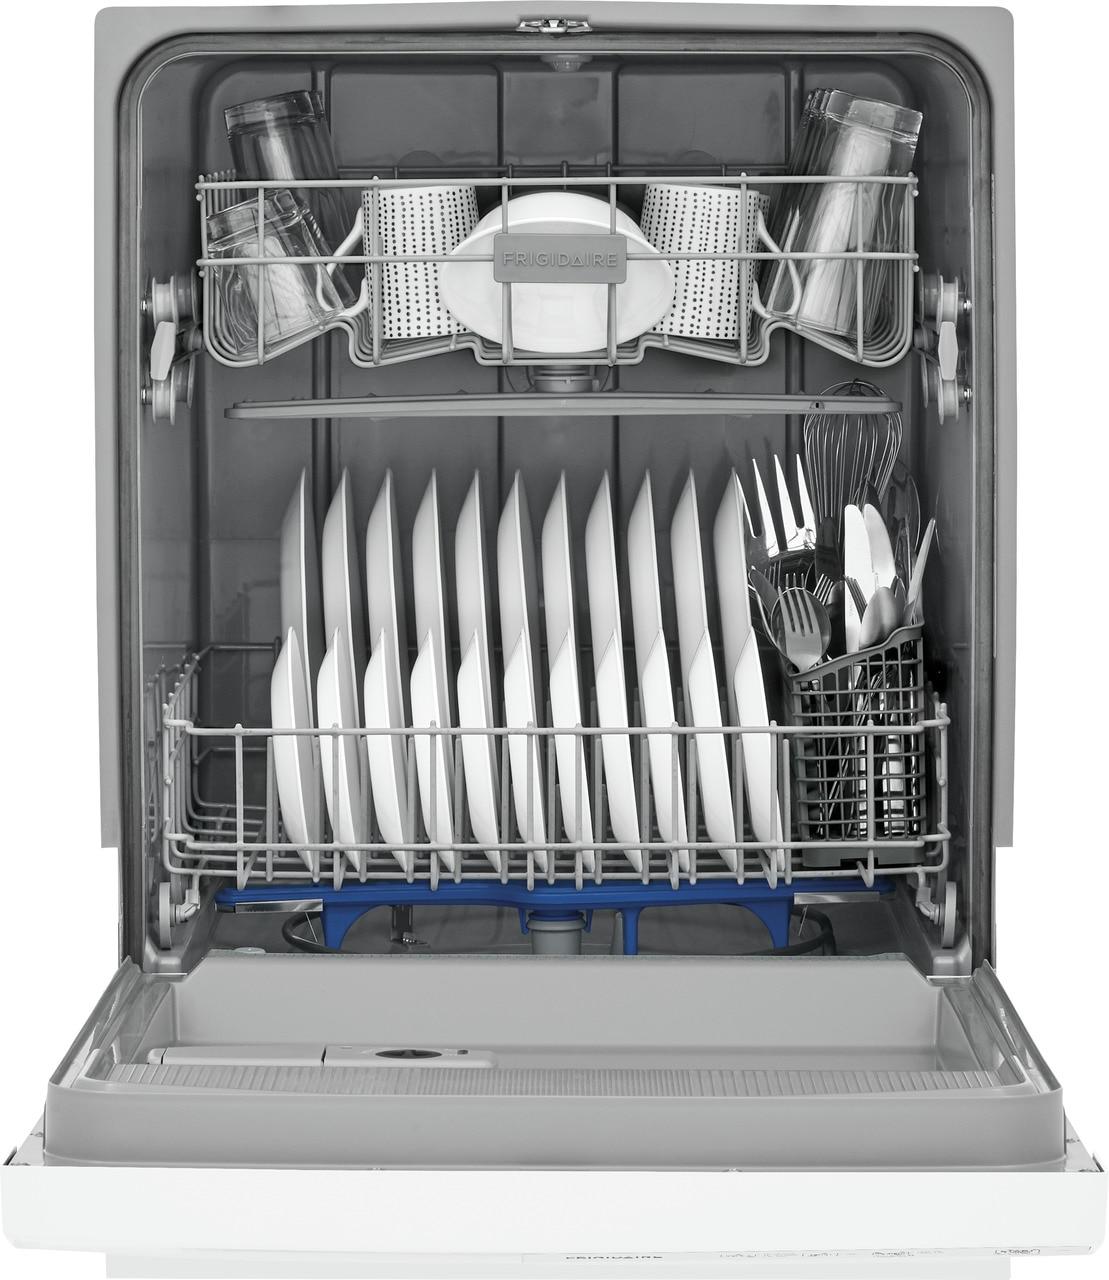 "Model: FFCD2413UW | Frigidaire 24"" Built-In Dishwasher"